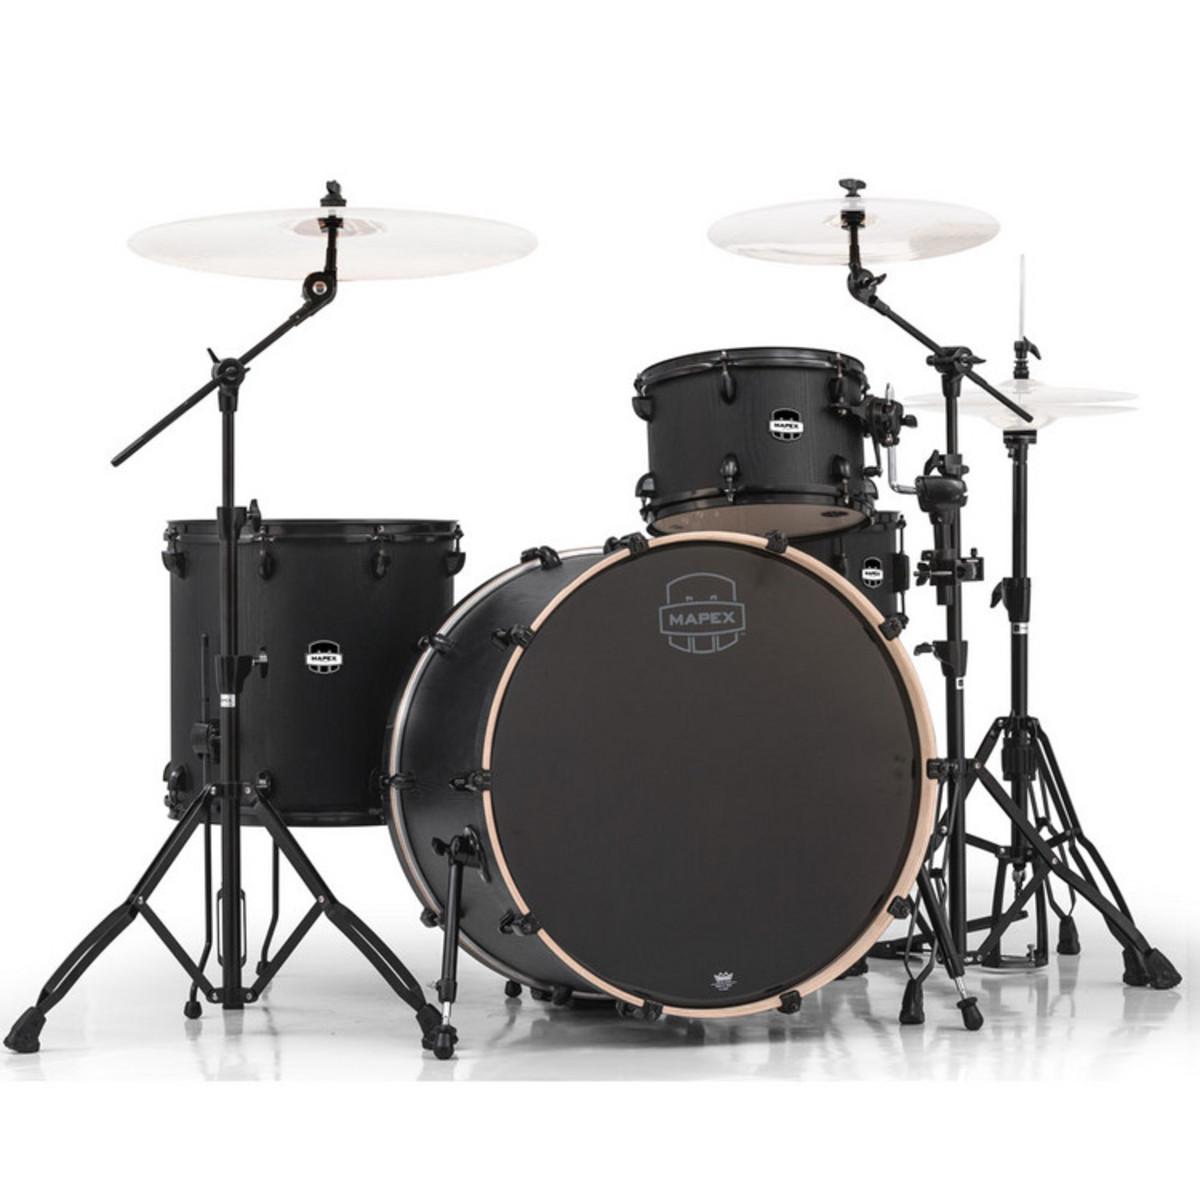 mapex mars 446 big beat 24 39 39 4 piece drum kit nightwood at. Black Bedroom Furniture Sets. Home Design Ideas